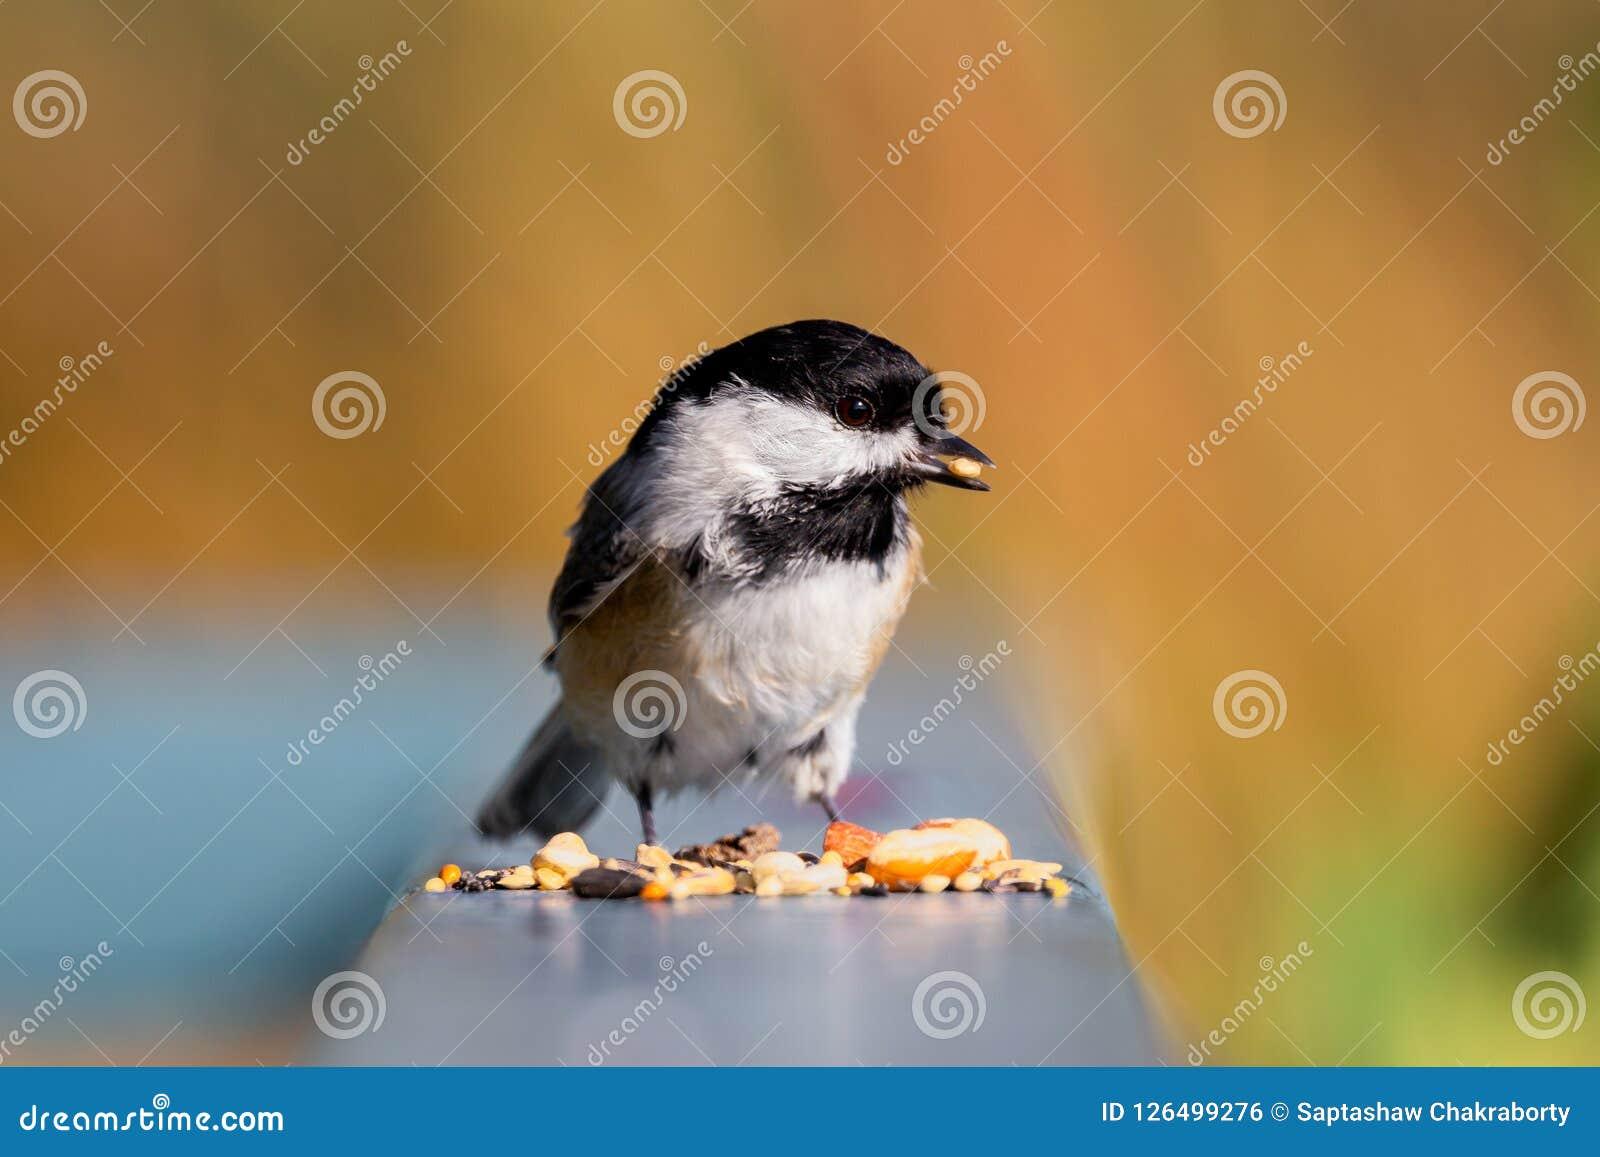 Chickadee покрытый чернотой с едой